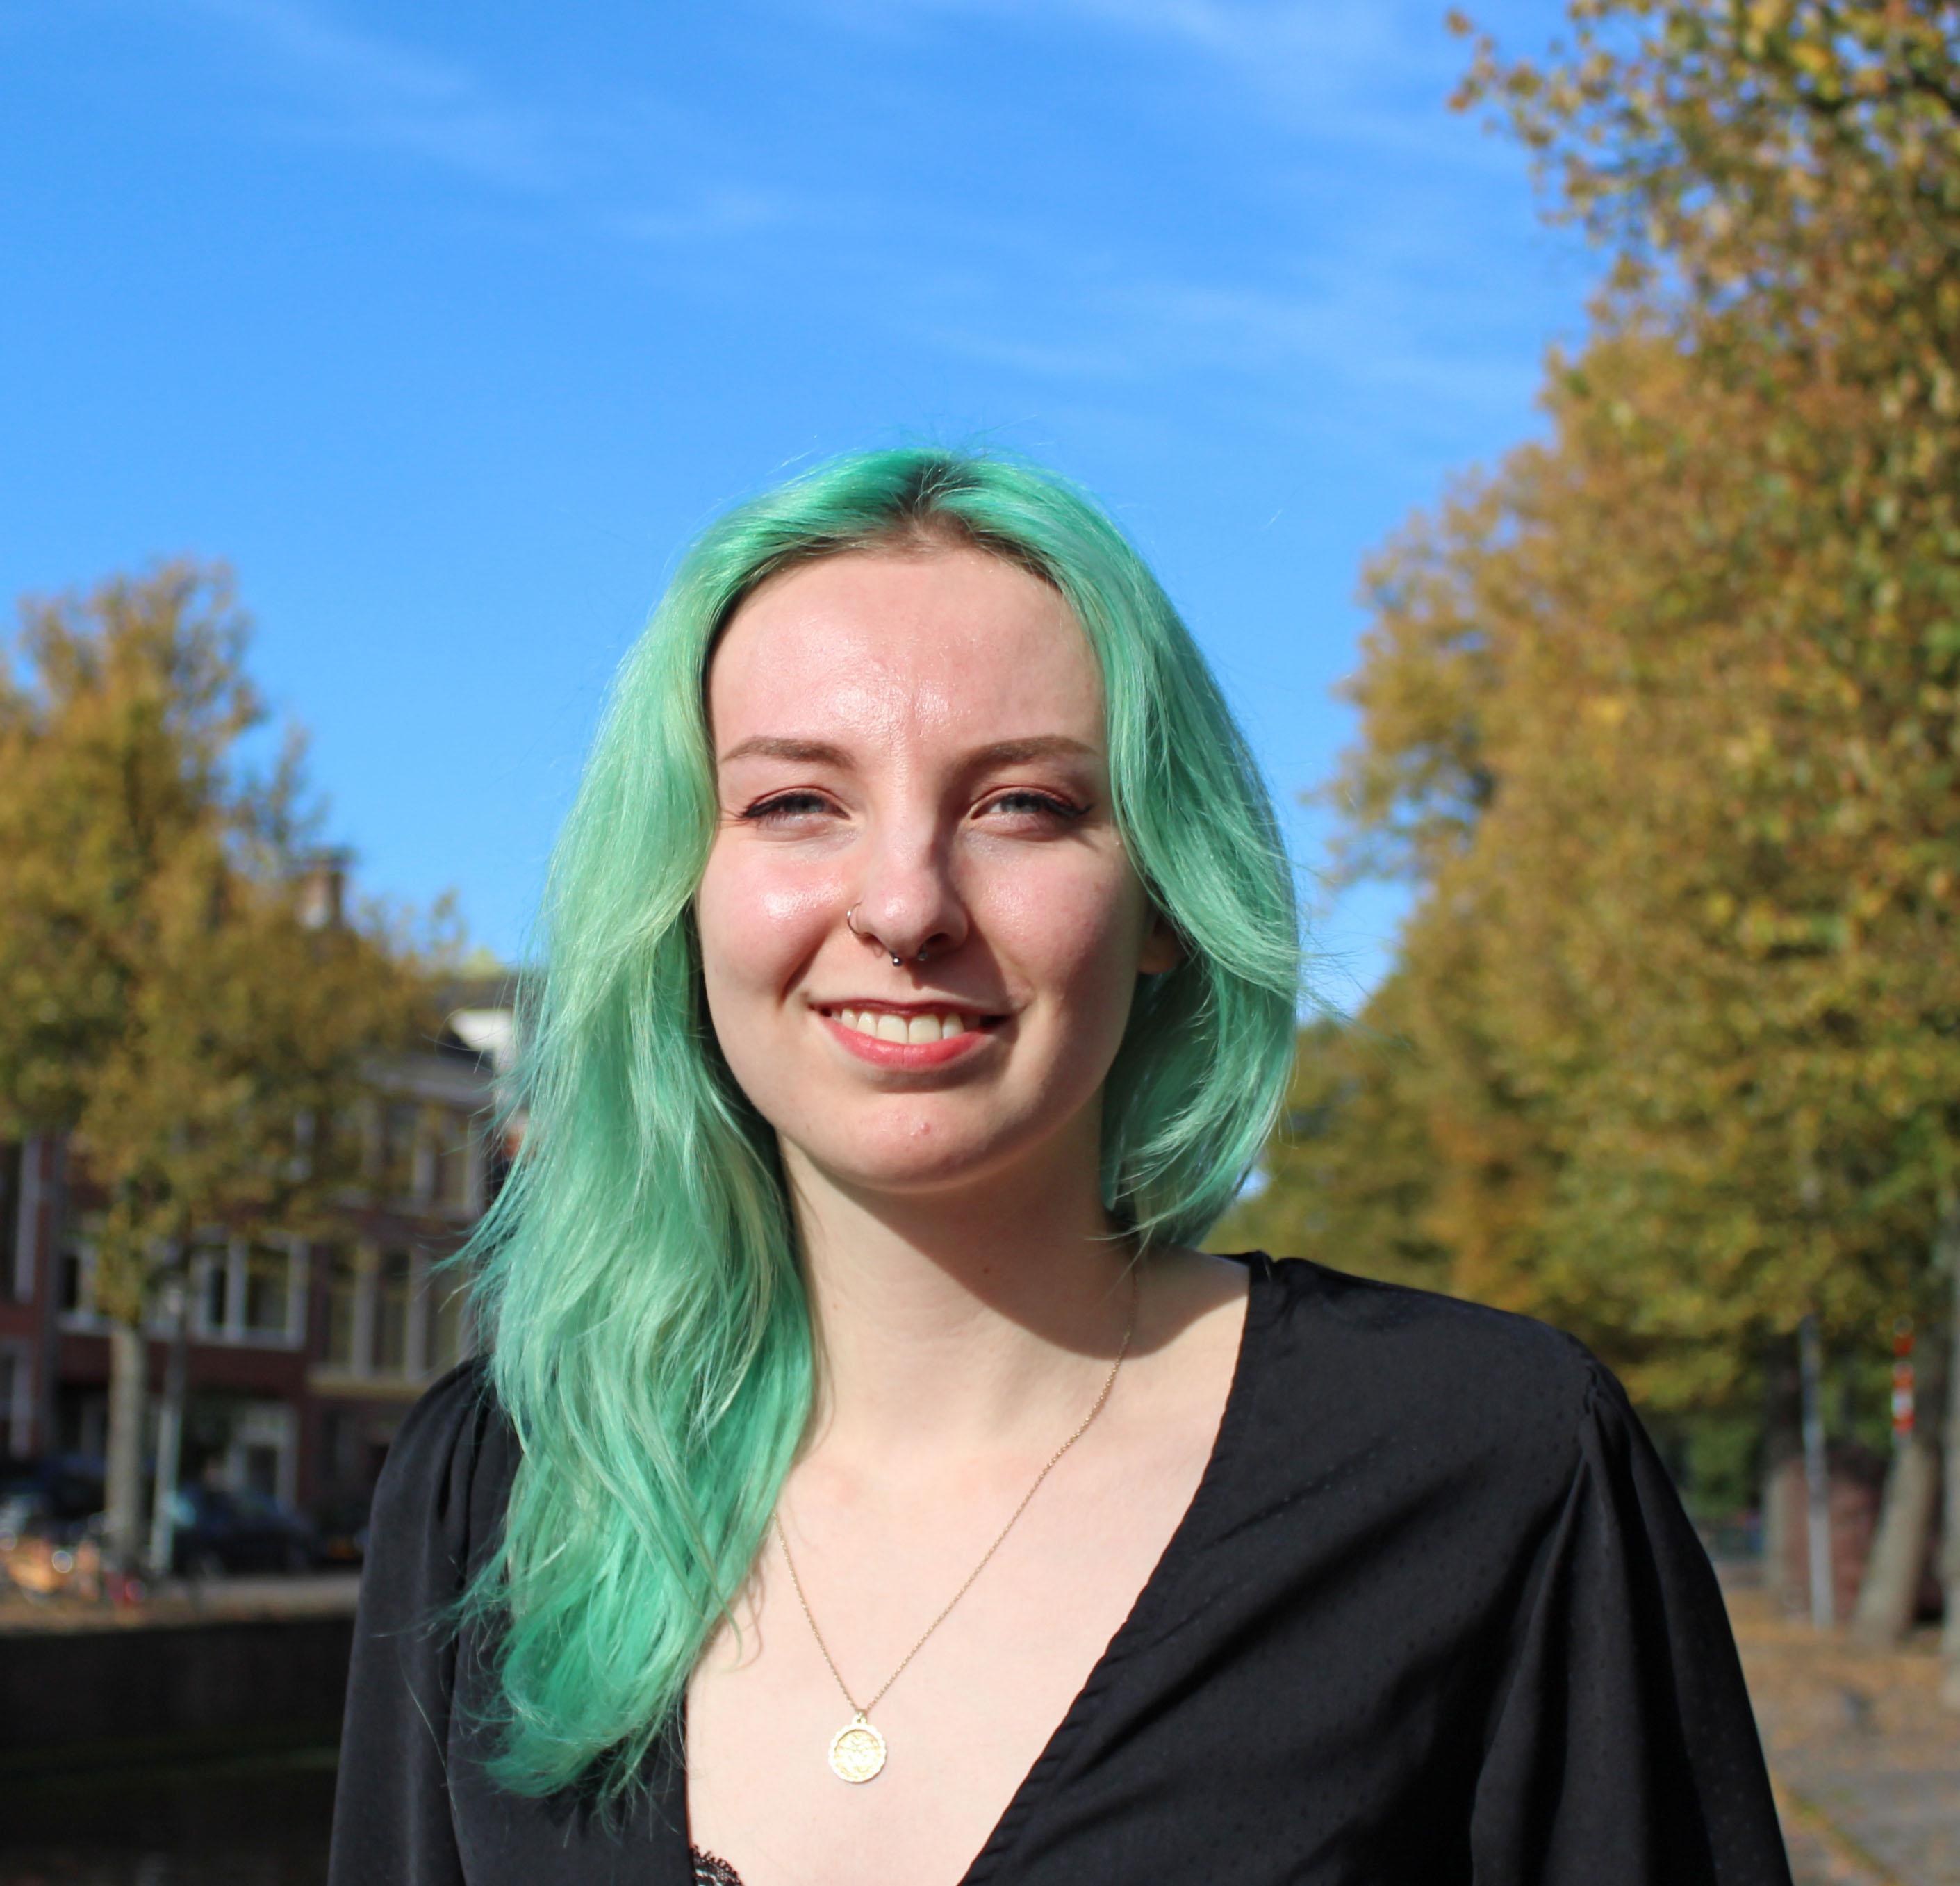 Sophie Elzinga